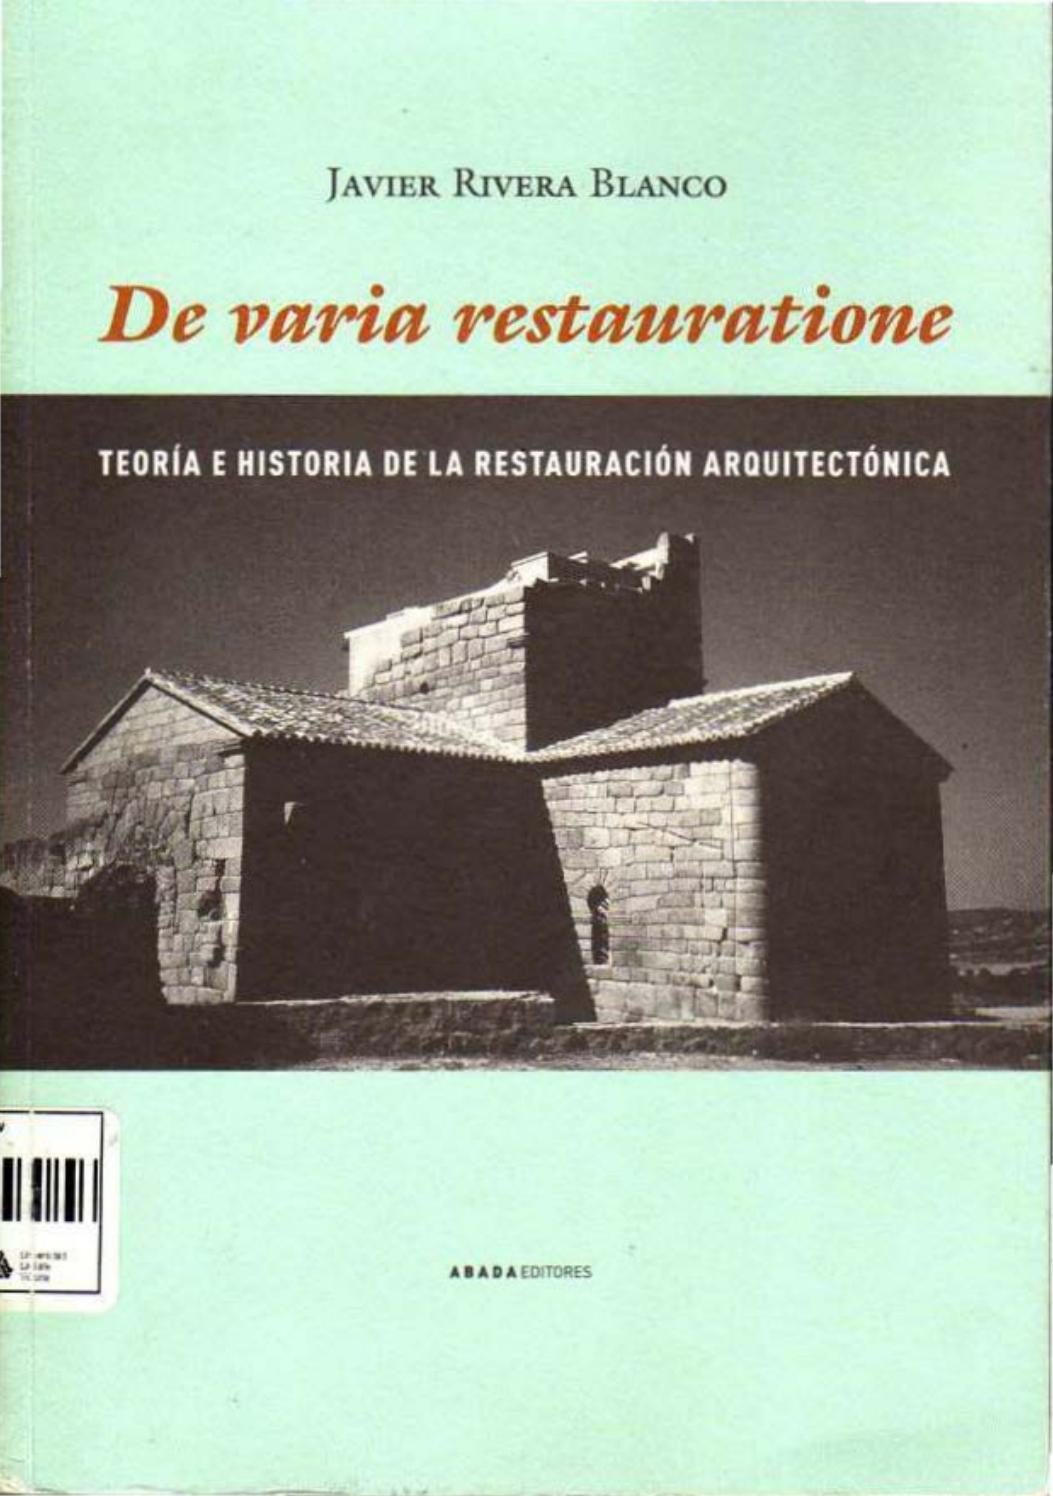 ▫⁞ Javier Rivera Blanco Teoria E Historia De La Restauracion Arquitectonica  ⁞▫Af By Madenxon - Issuu